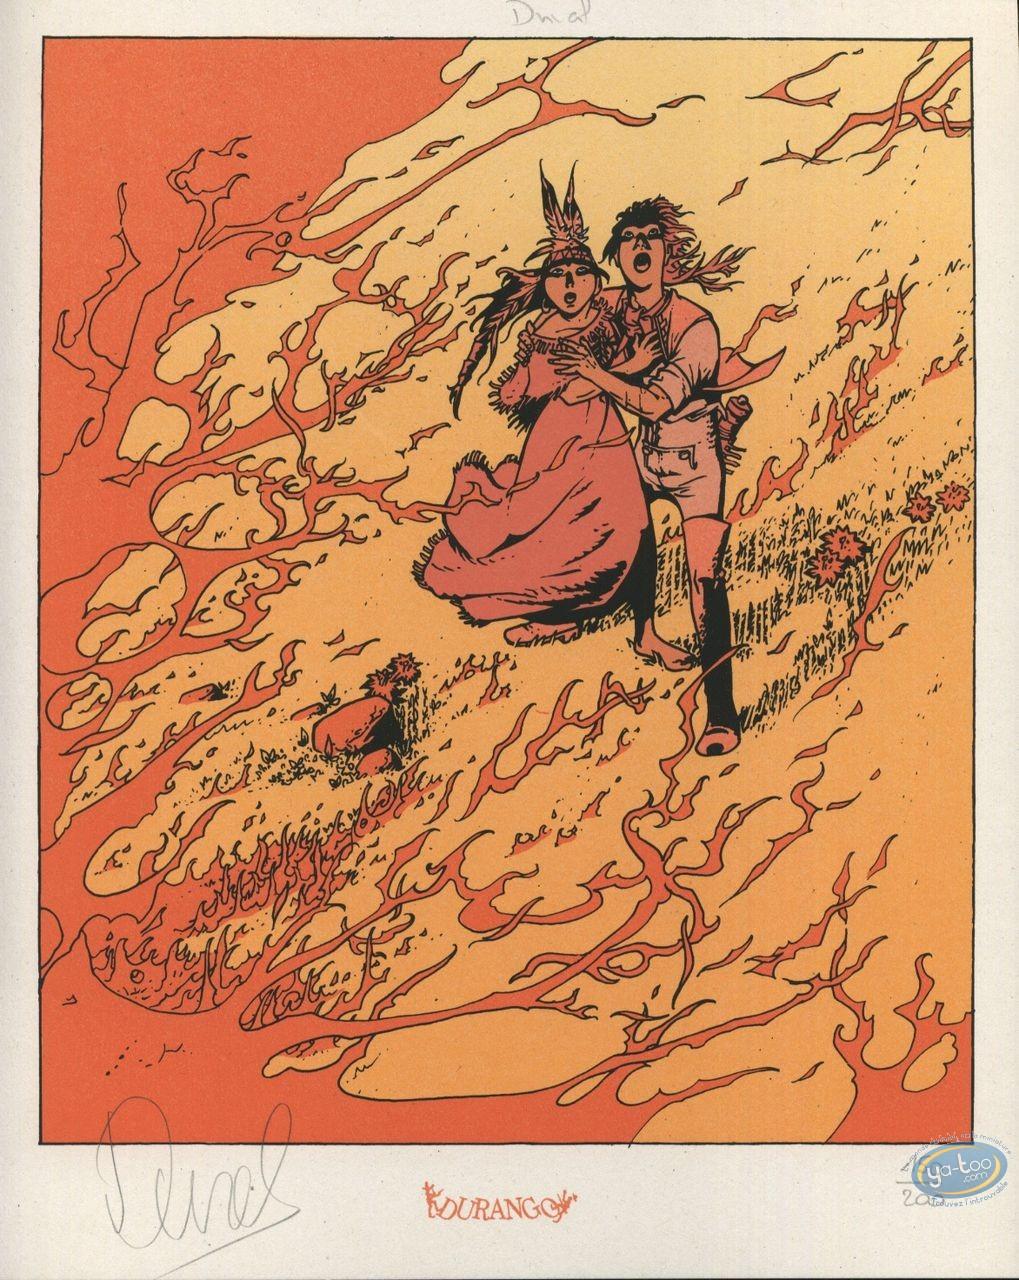 Ex-libris Sérigraphie, Lutins (Les) : Feu